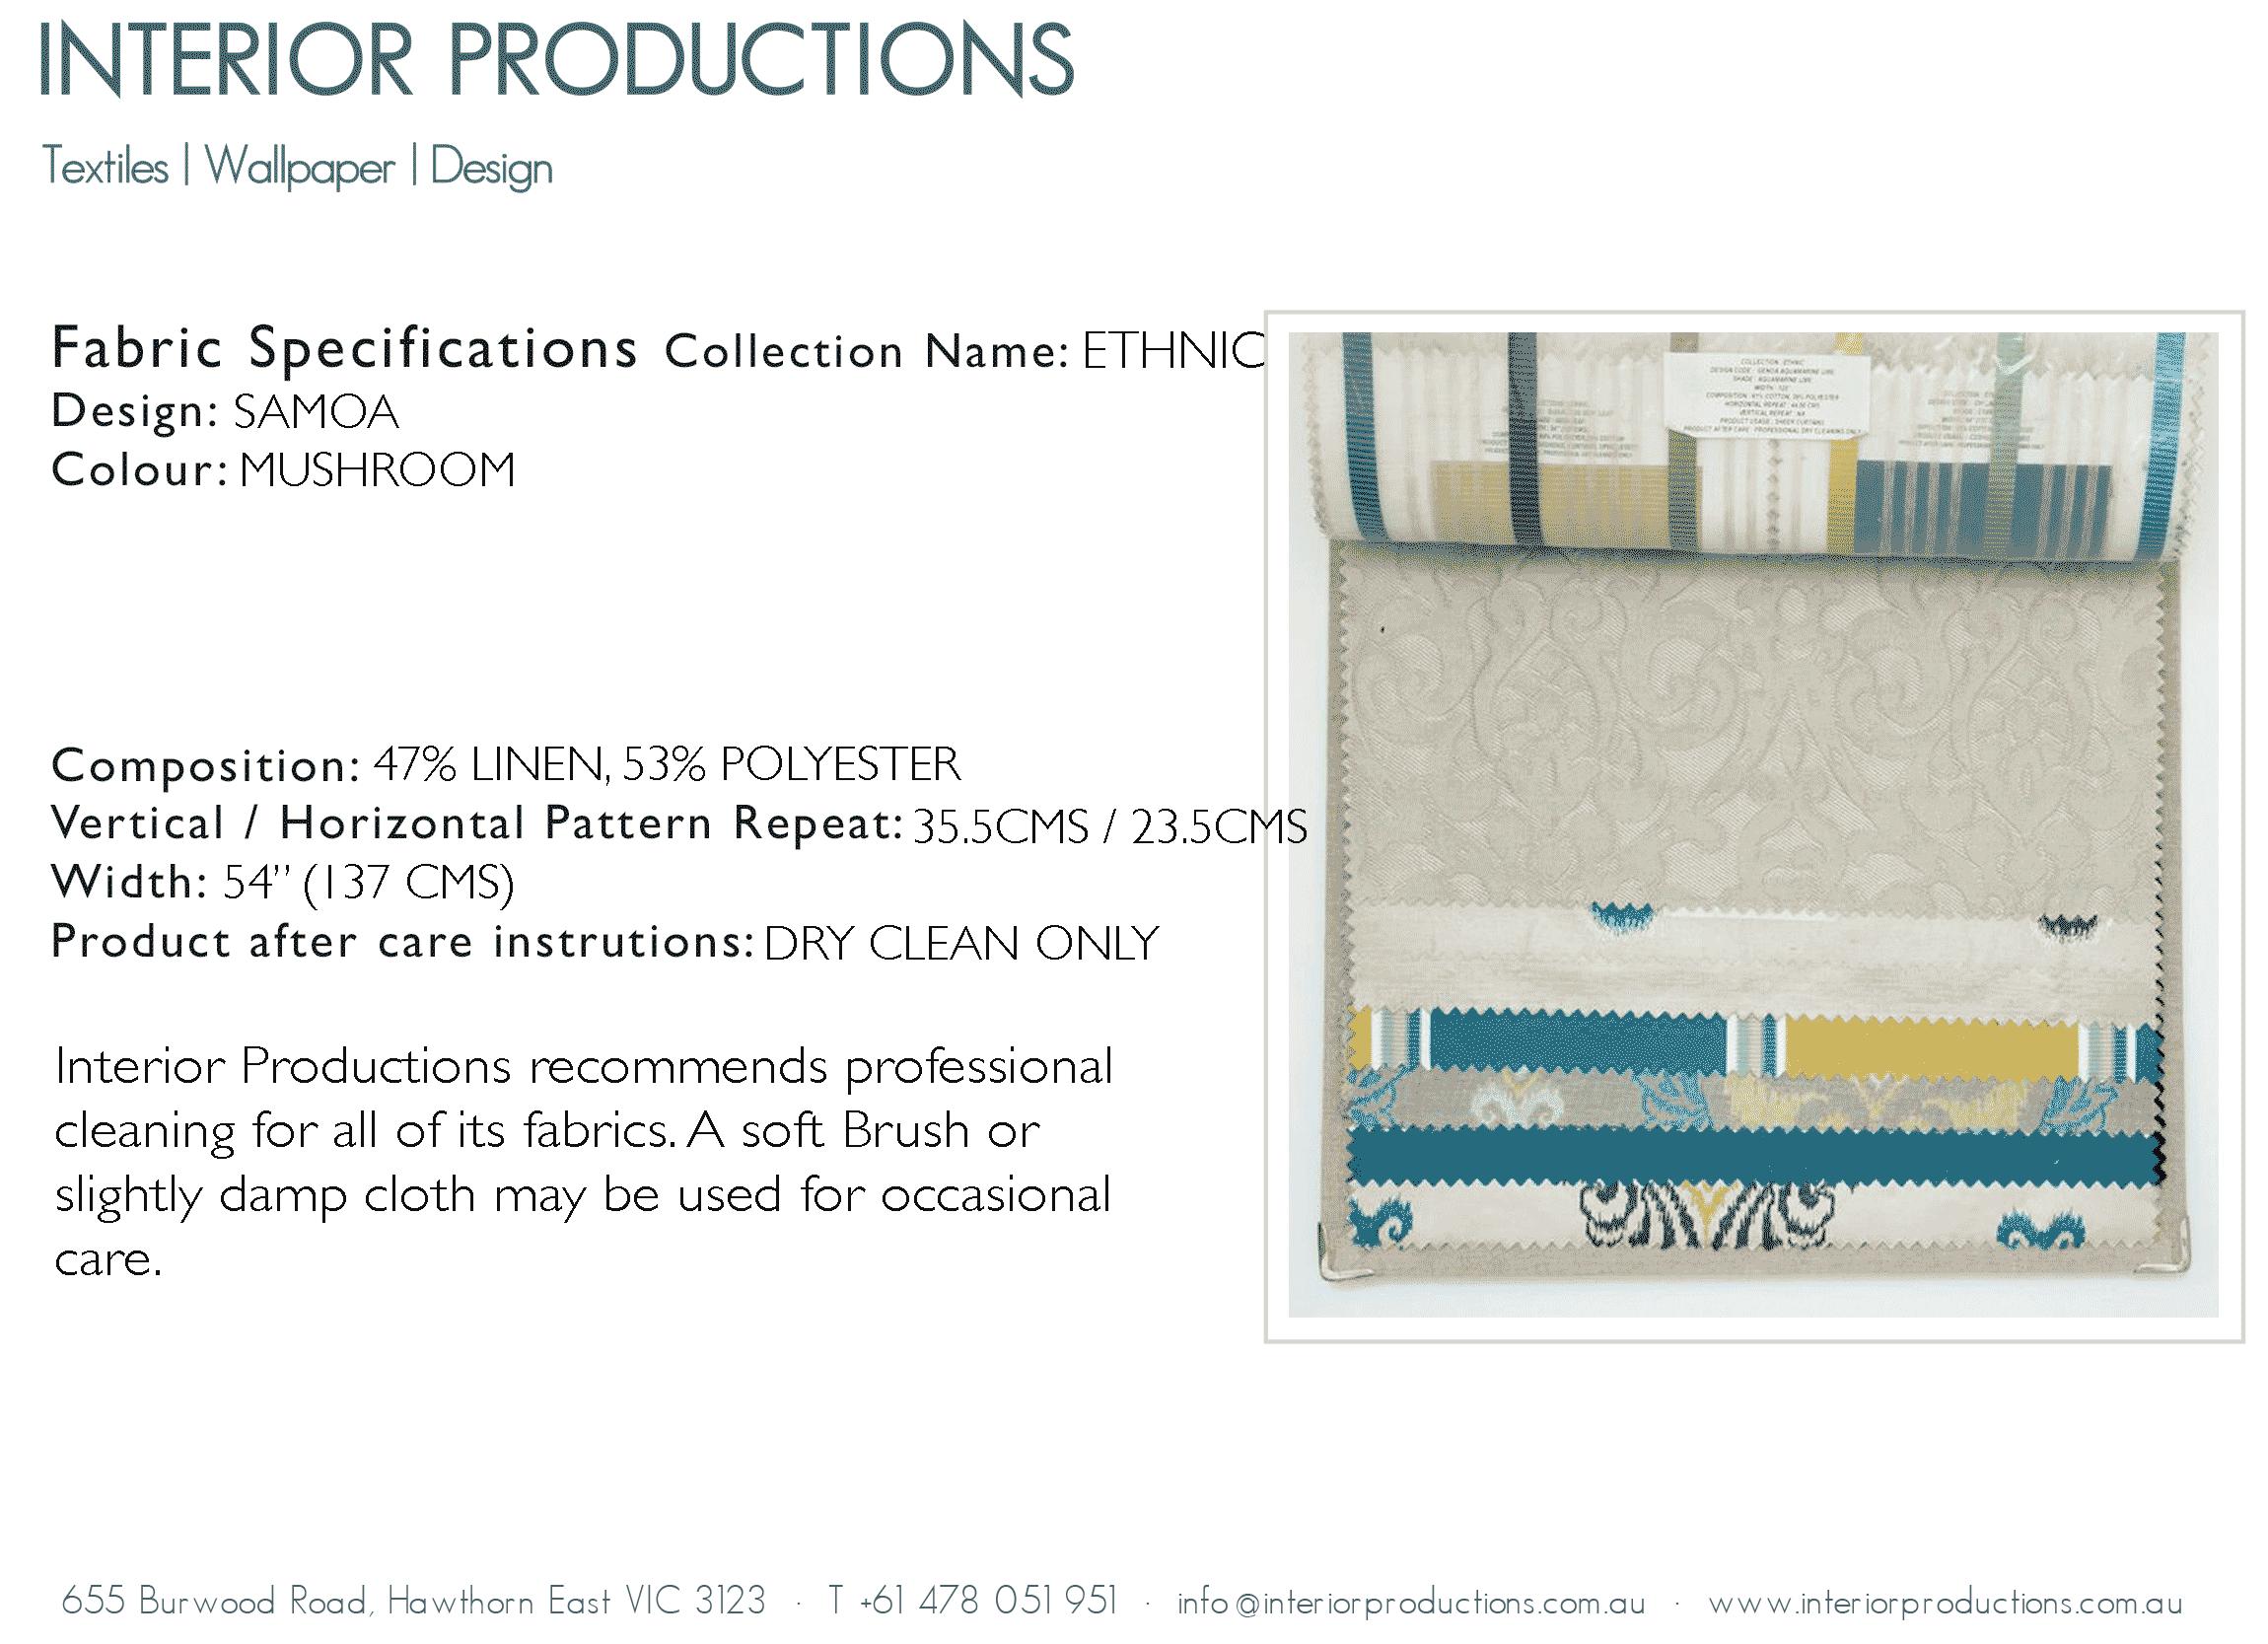 interior_productions_SAMOA---MUSHROOM